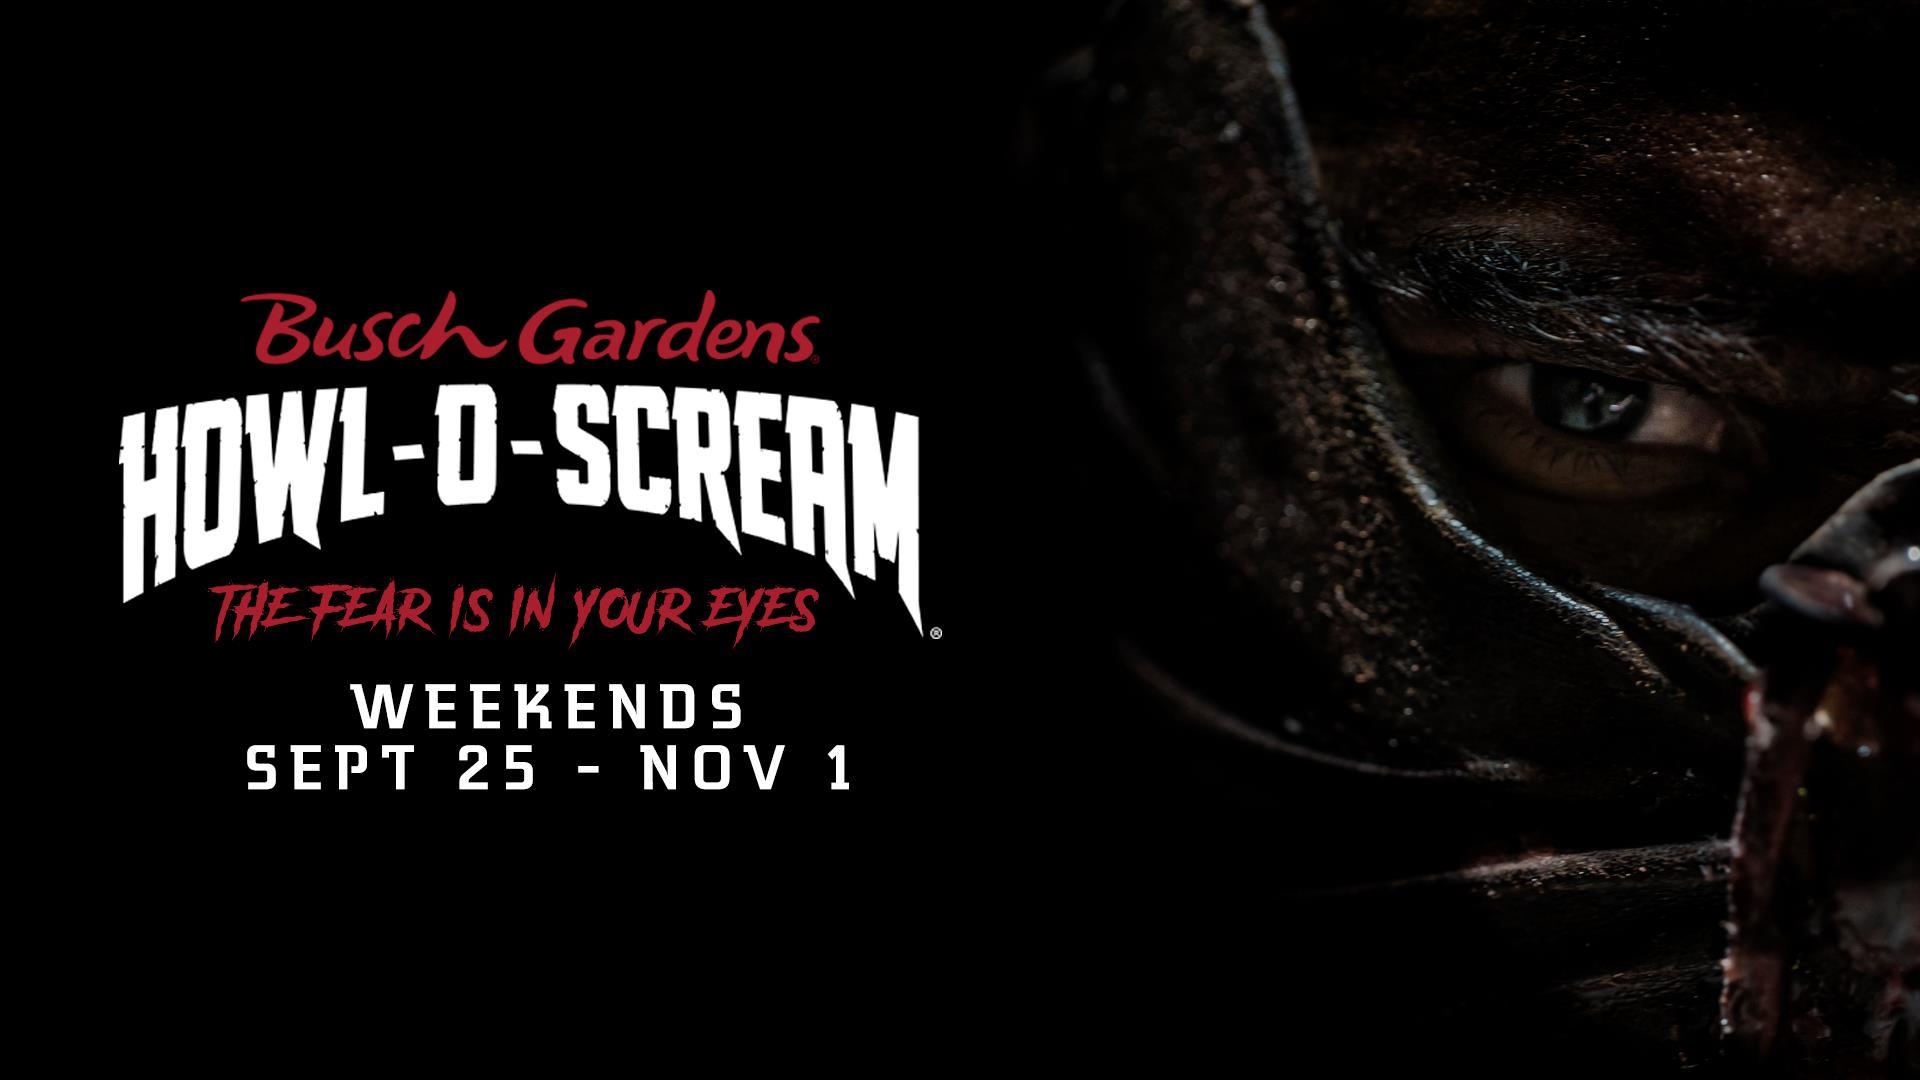 1900x600 BGT Events HowlOScream2020 Info - Busch Gardens Howl O Scream What Rides Open